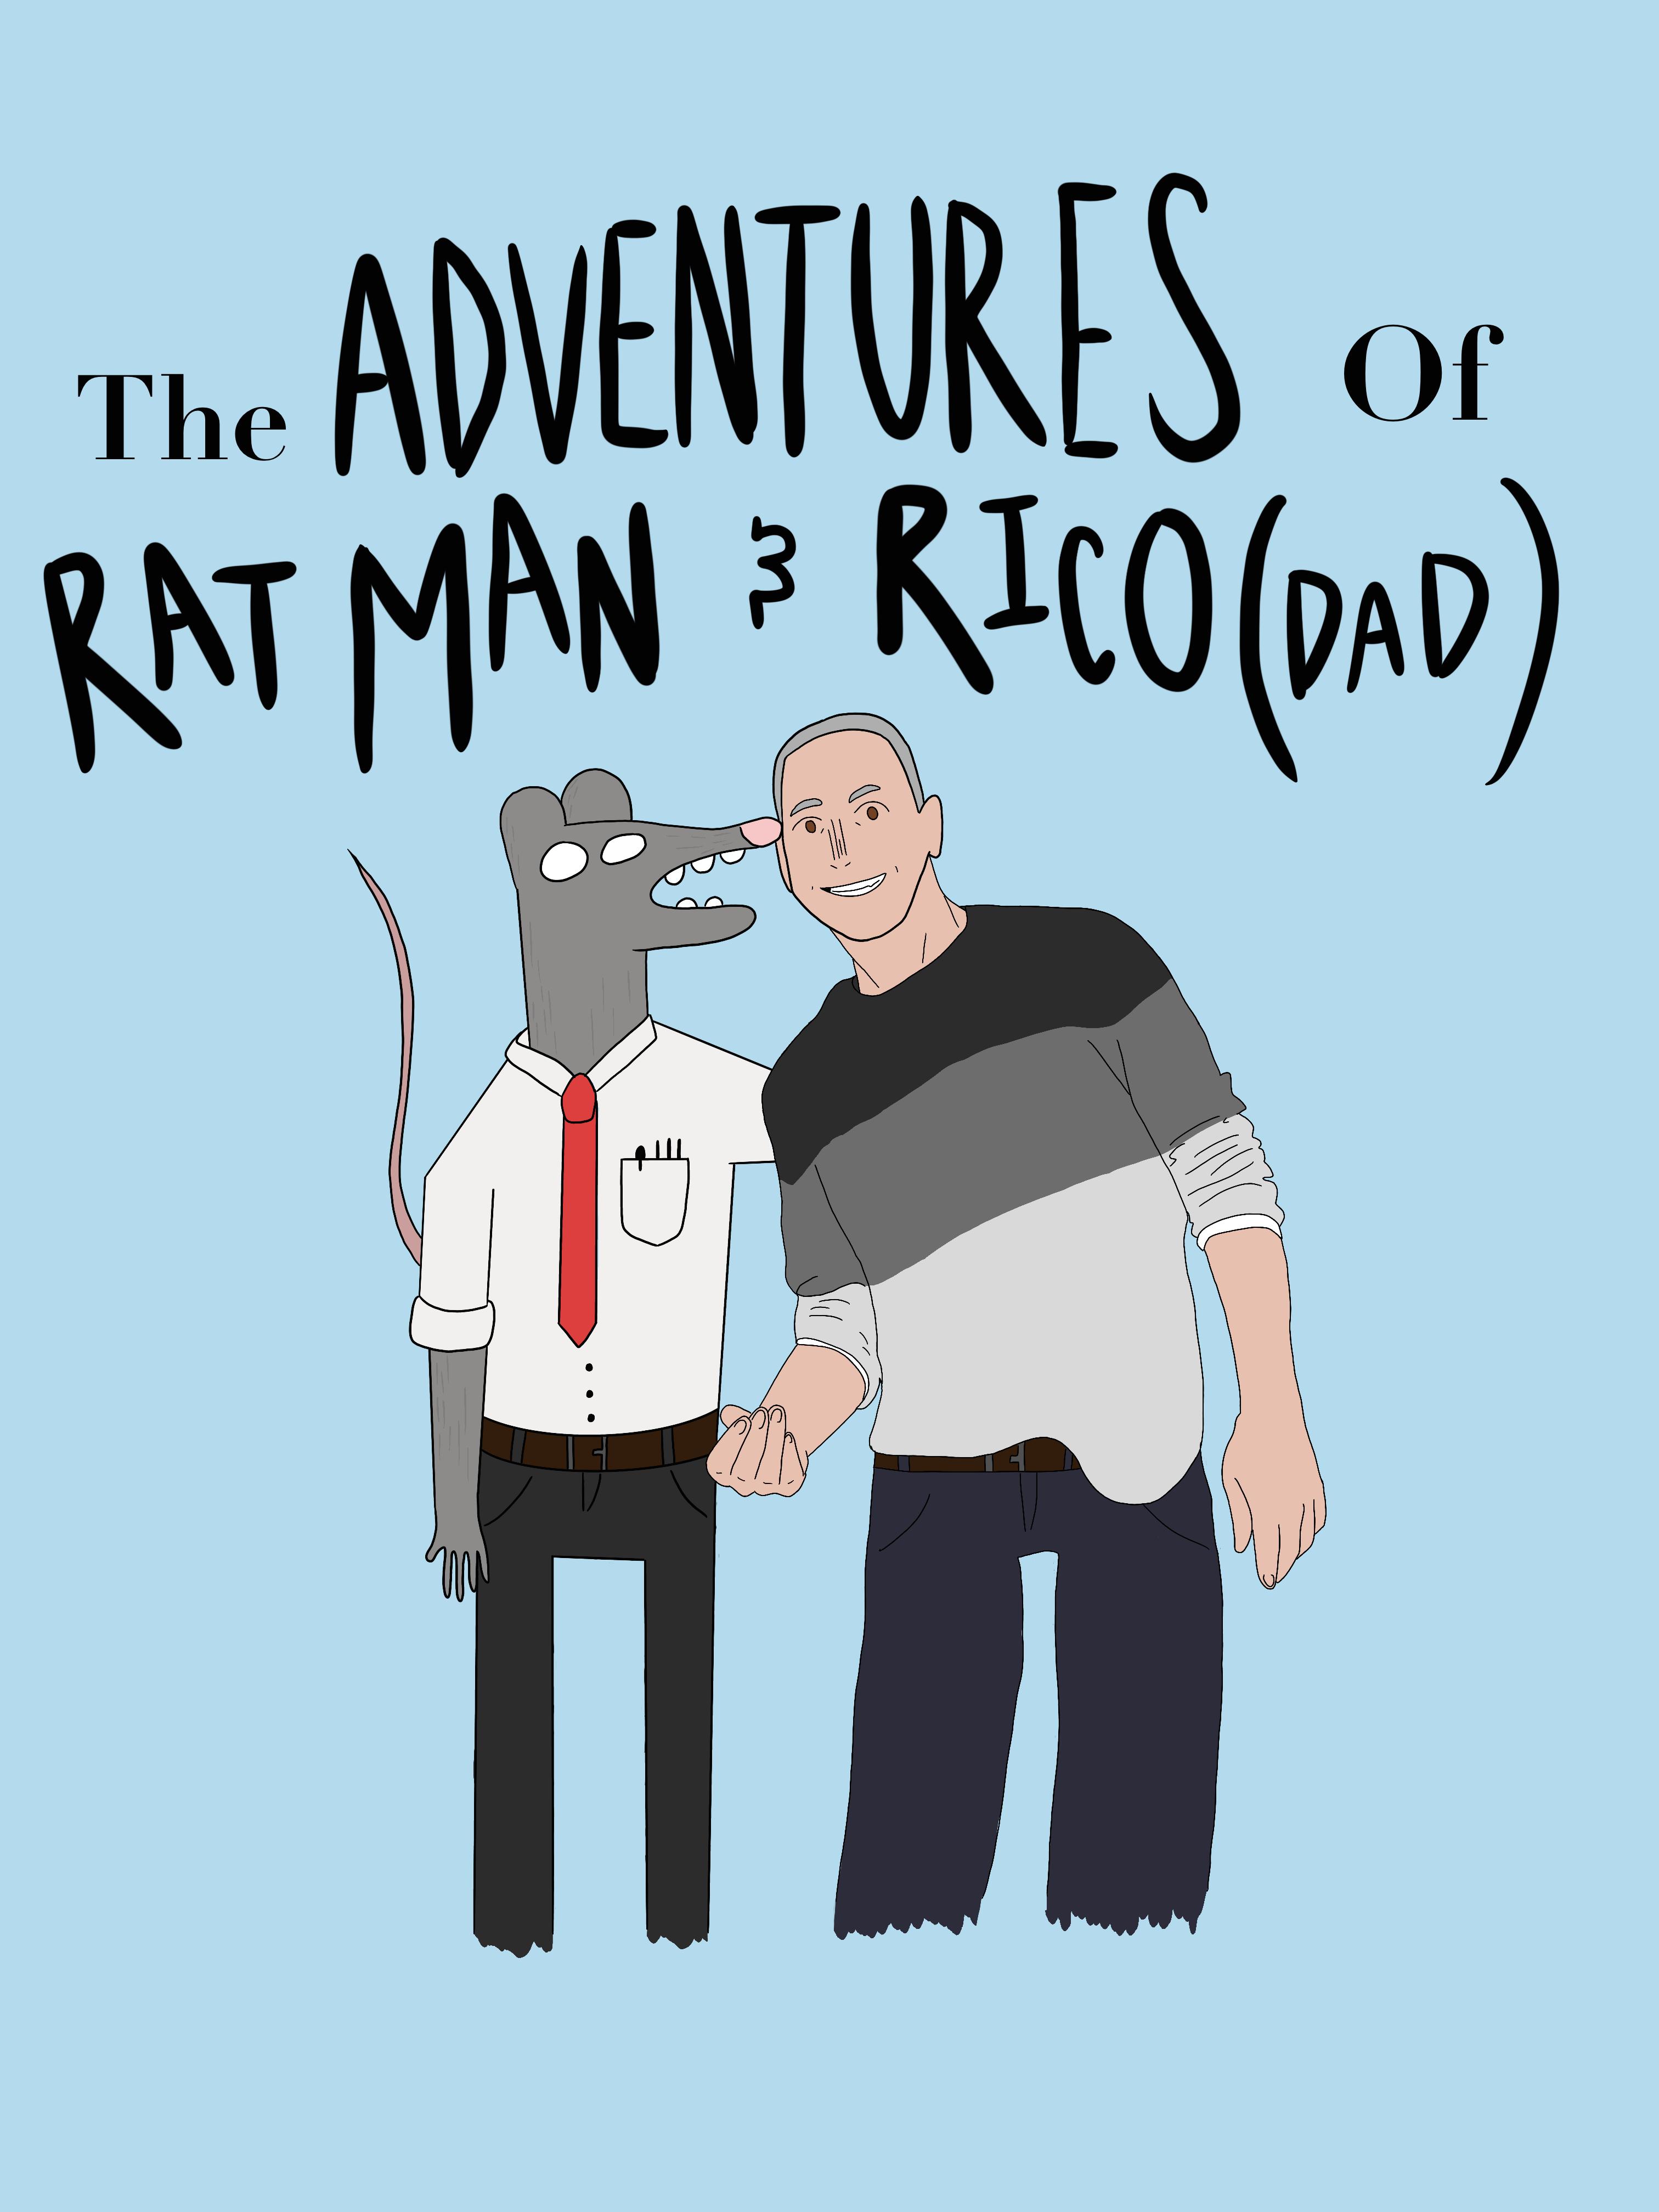 Adventures of RatMan & Rico